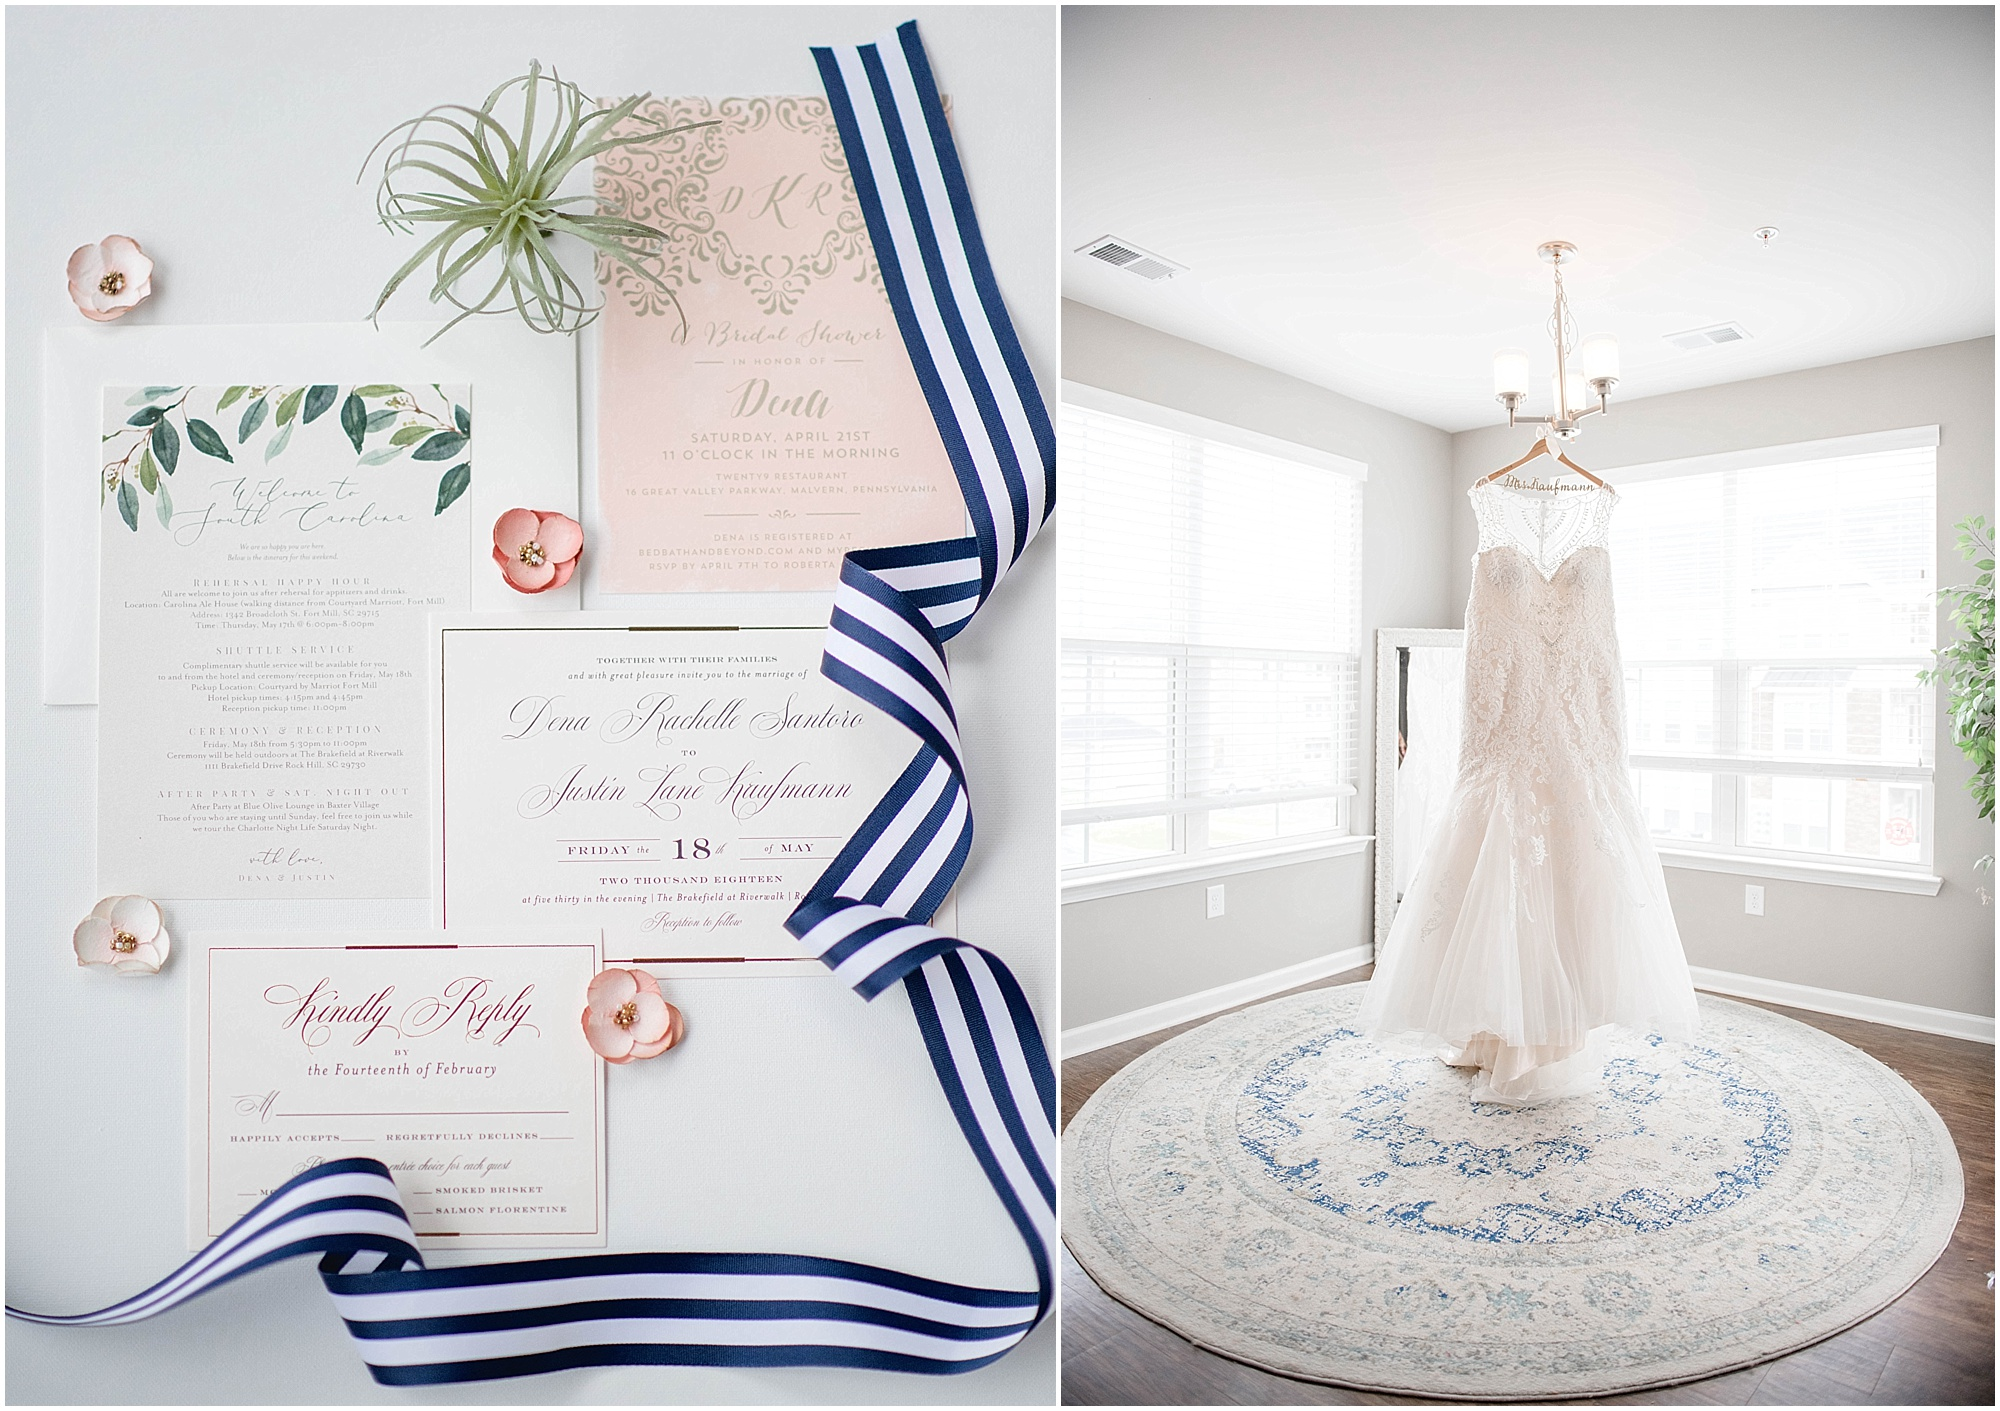 Adivas Photography Luxury Boutique Wedding Service_0767.jpg